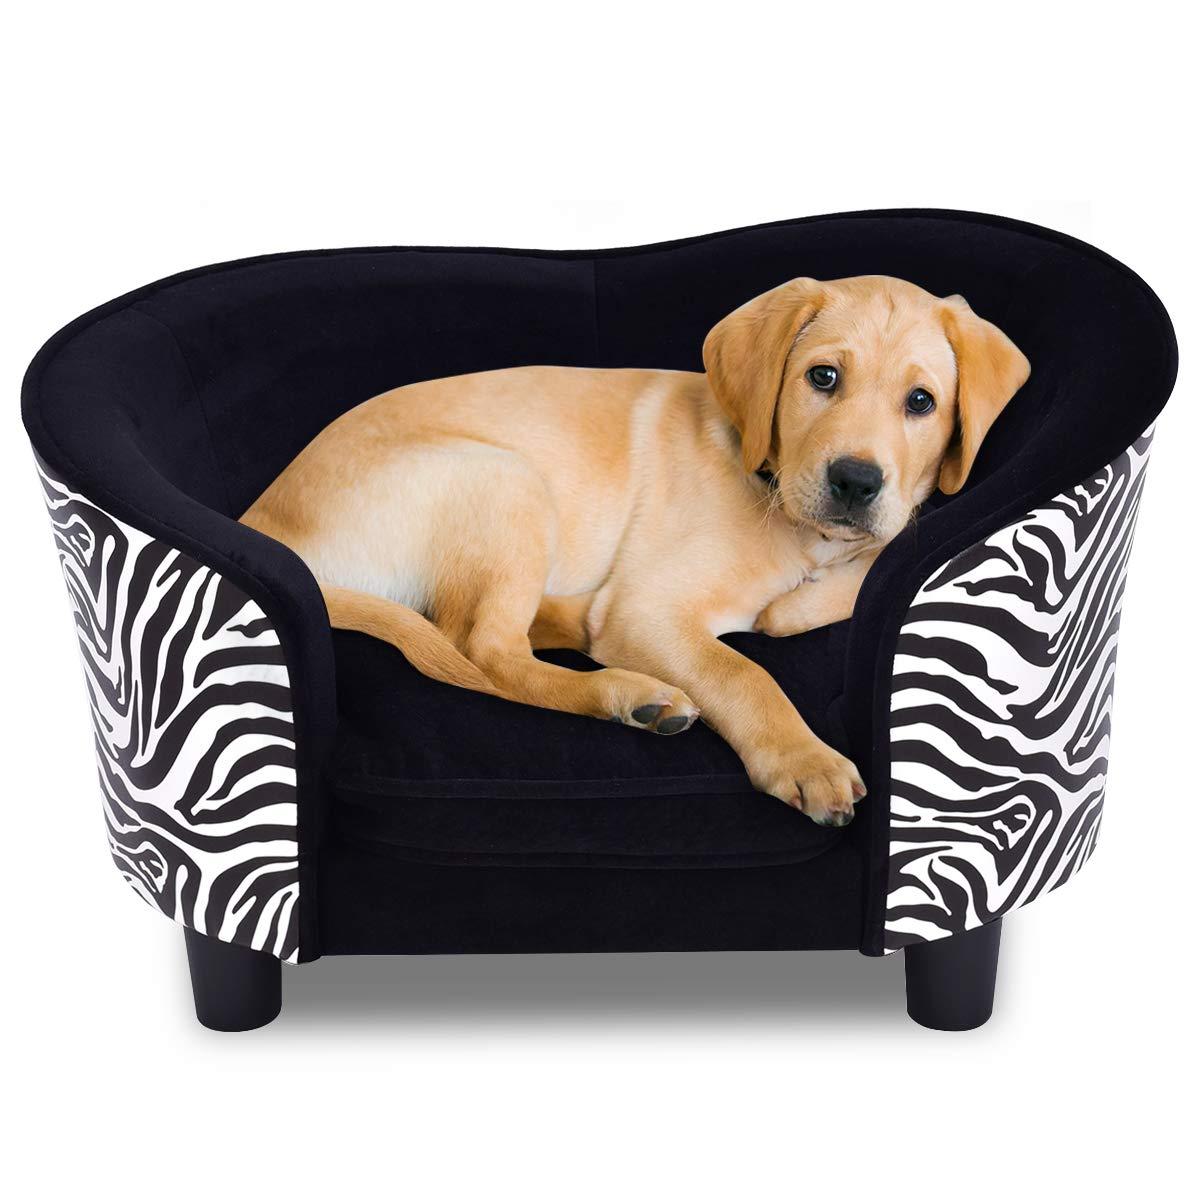 Amazon.com: giantex Pet Salón Sofá Perro Cachorro Cama ...